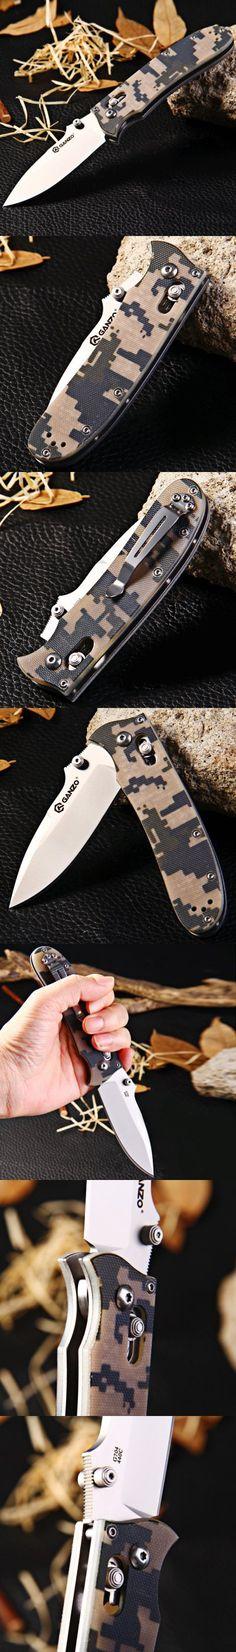 Pocket Knives and Folding Knives | Ganzo G704-CA Axis Lock Folding Knife